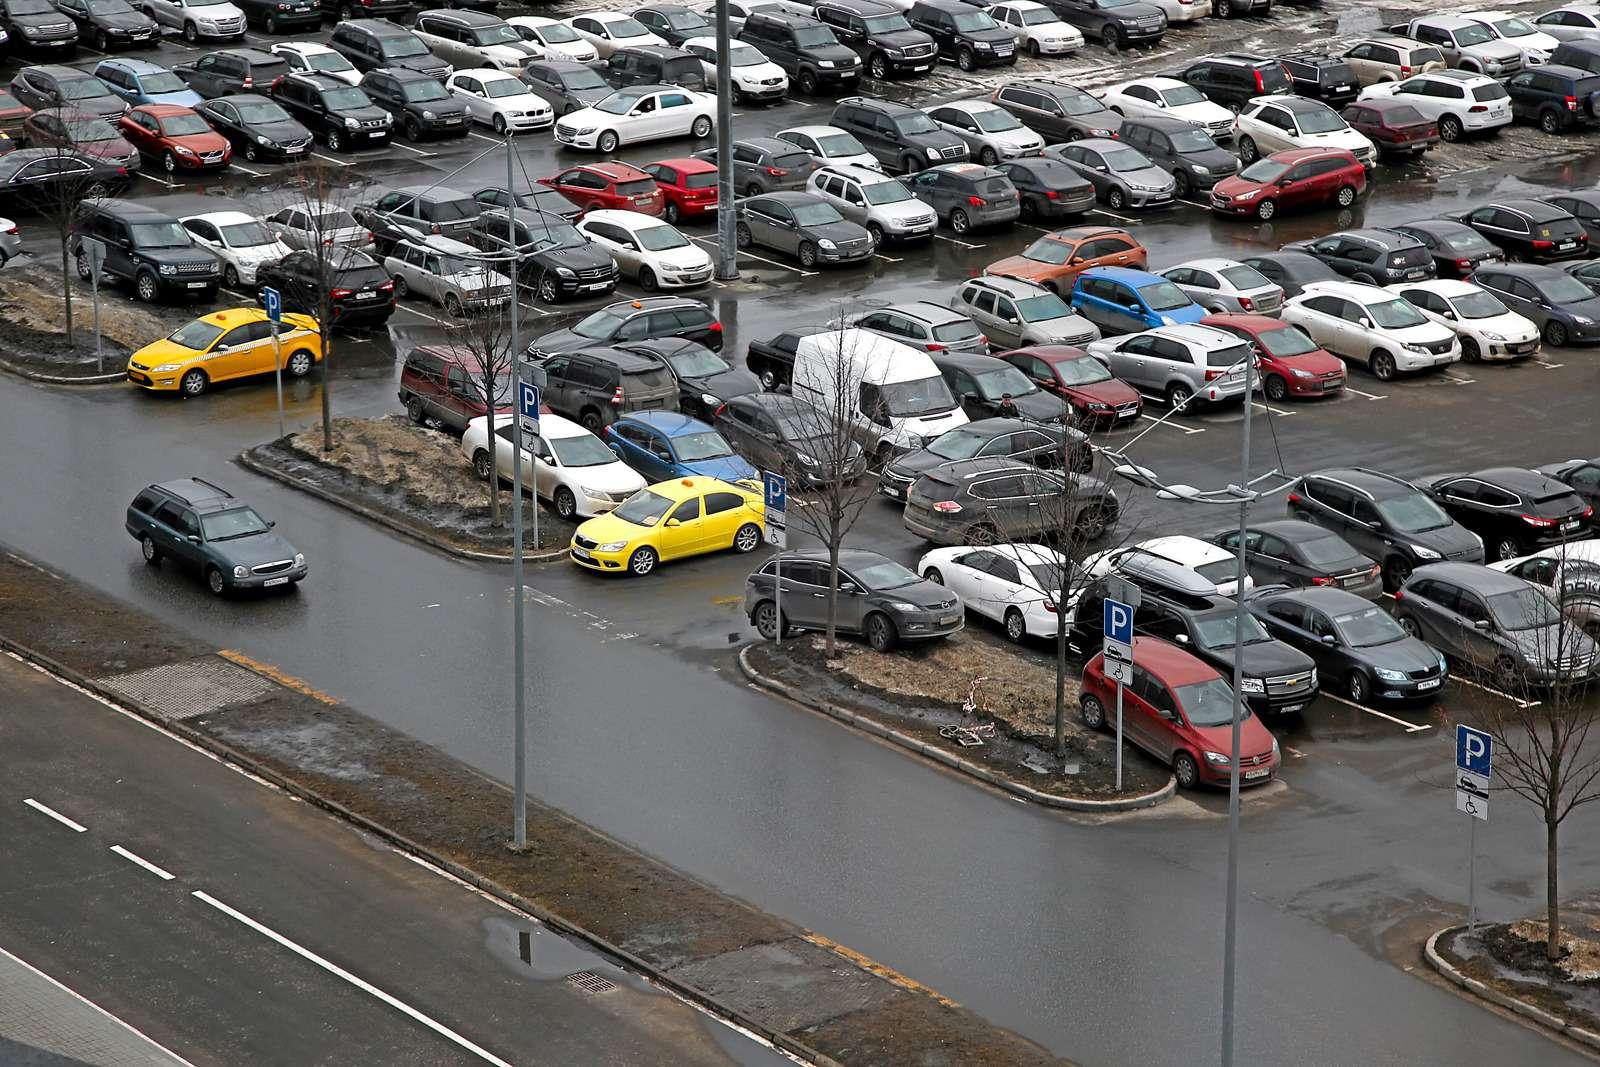 Парковка— дляинвалидов или длялжеинвалидов? Рейд ЗР— фото 585764